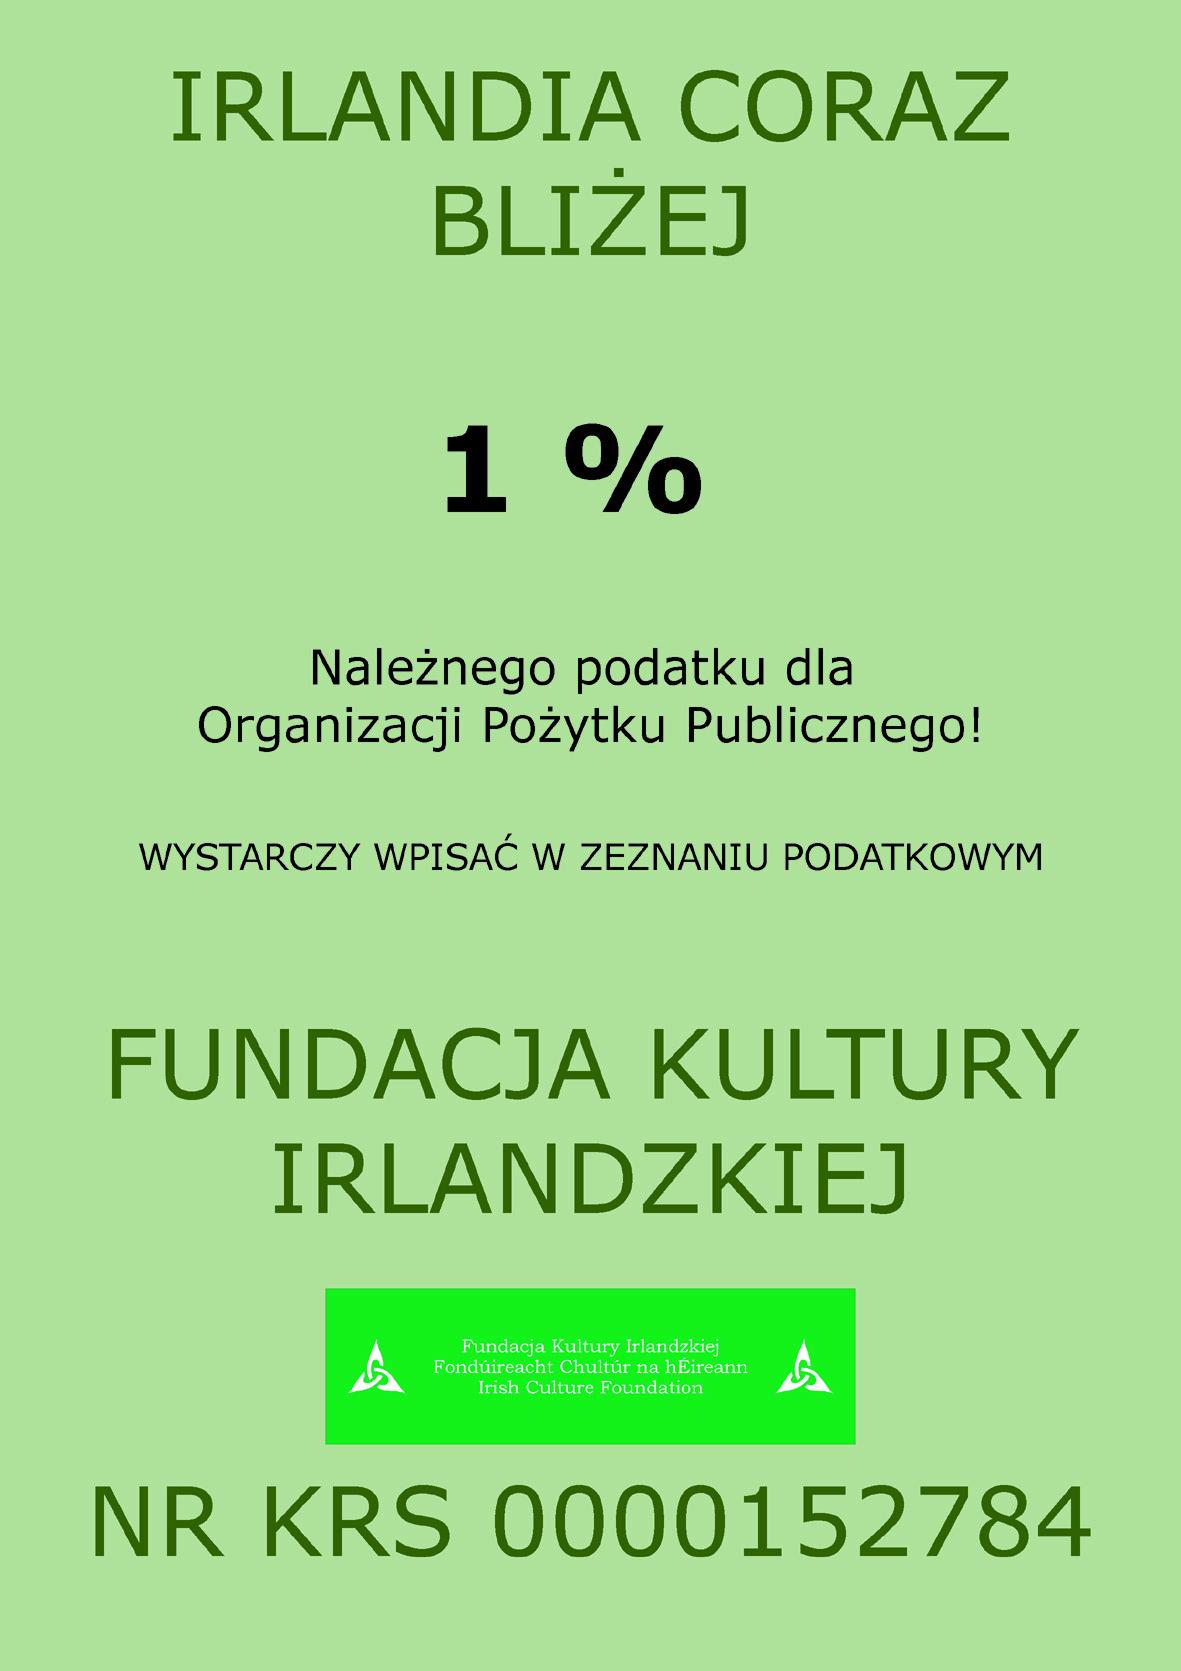 1% dla FKI